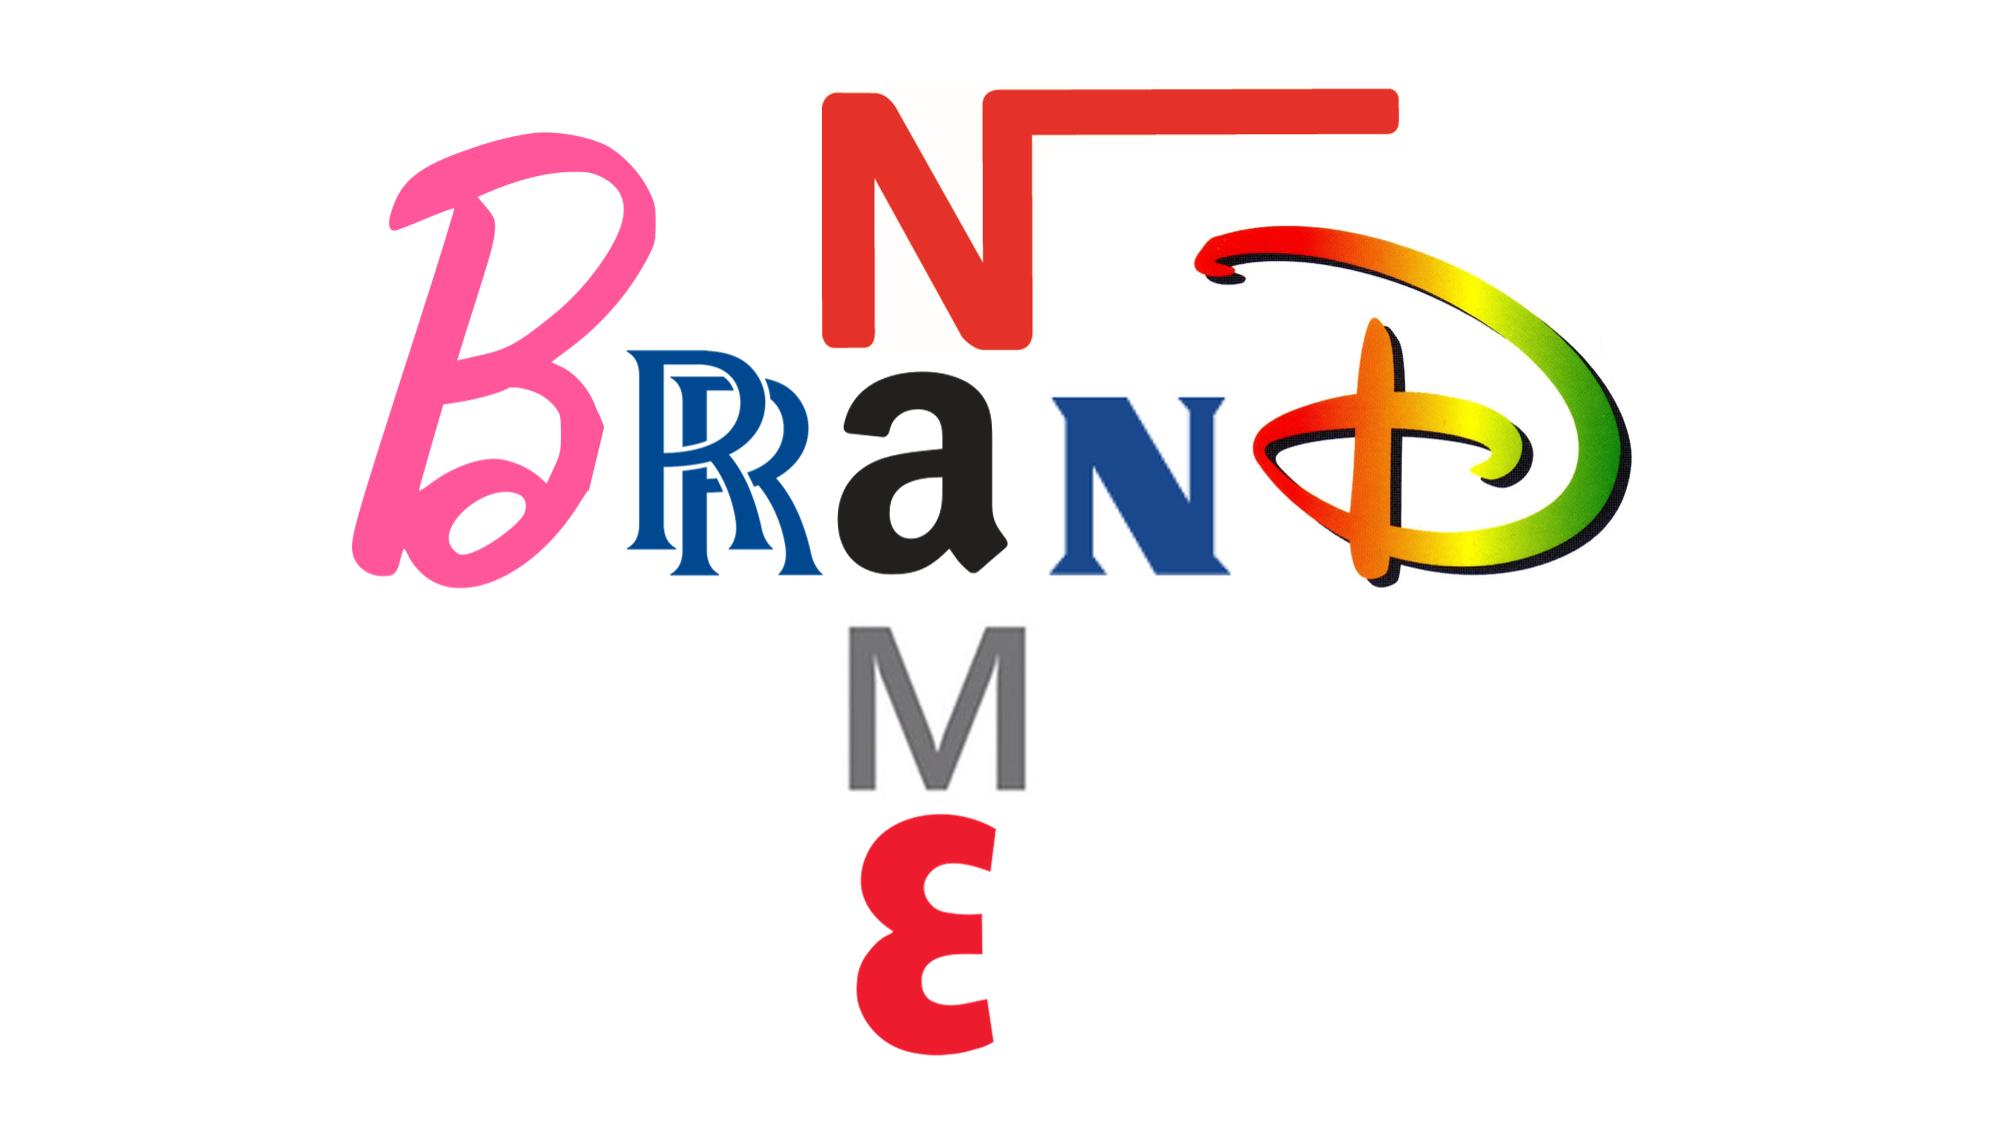 Perfect Brand Name.